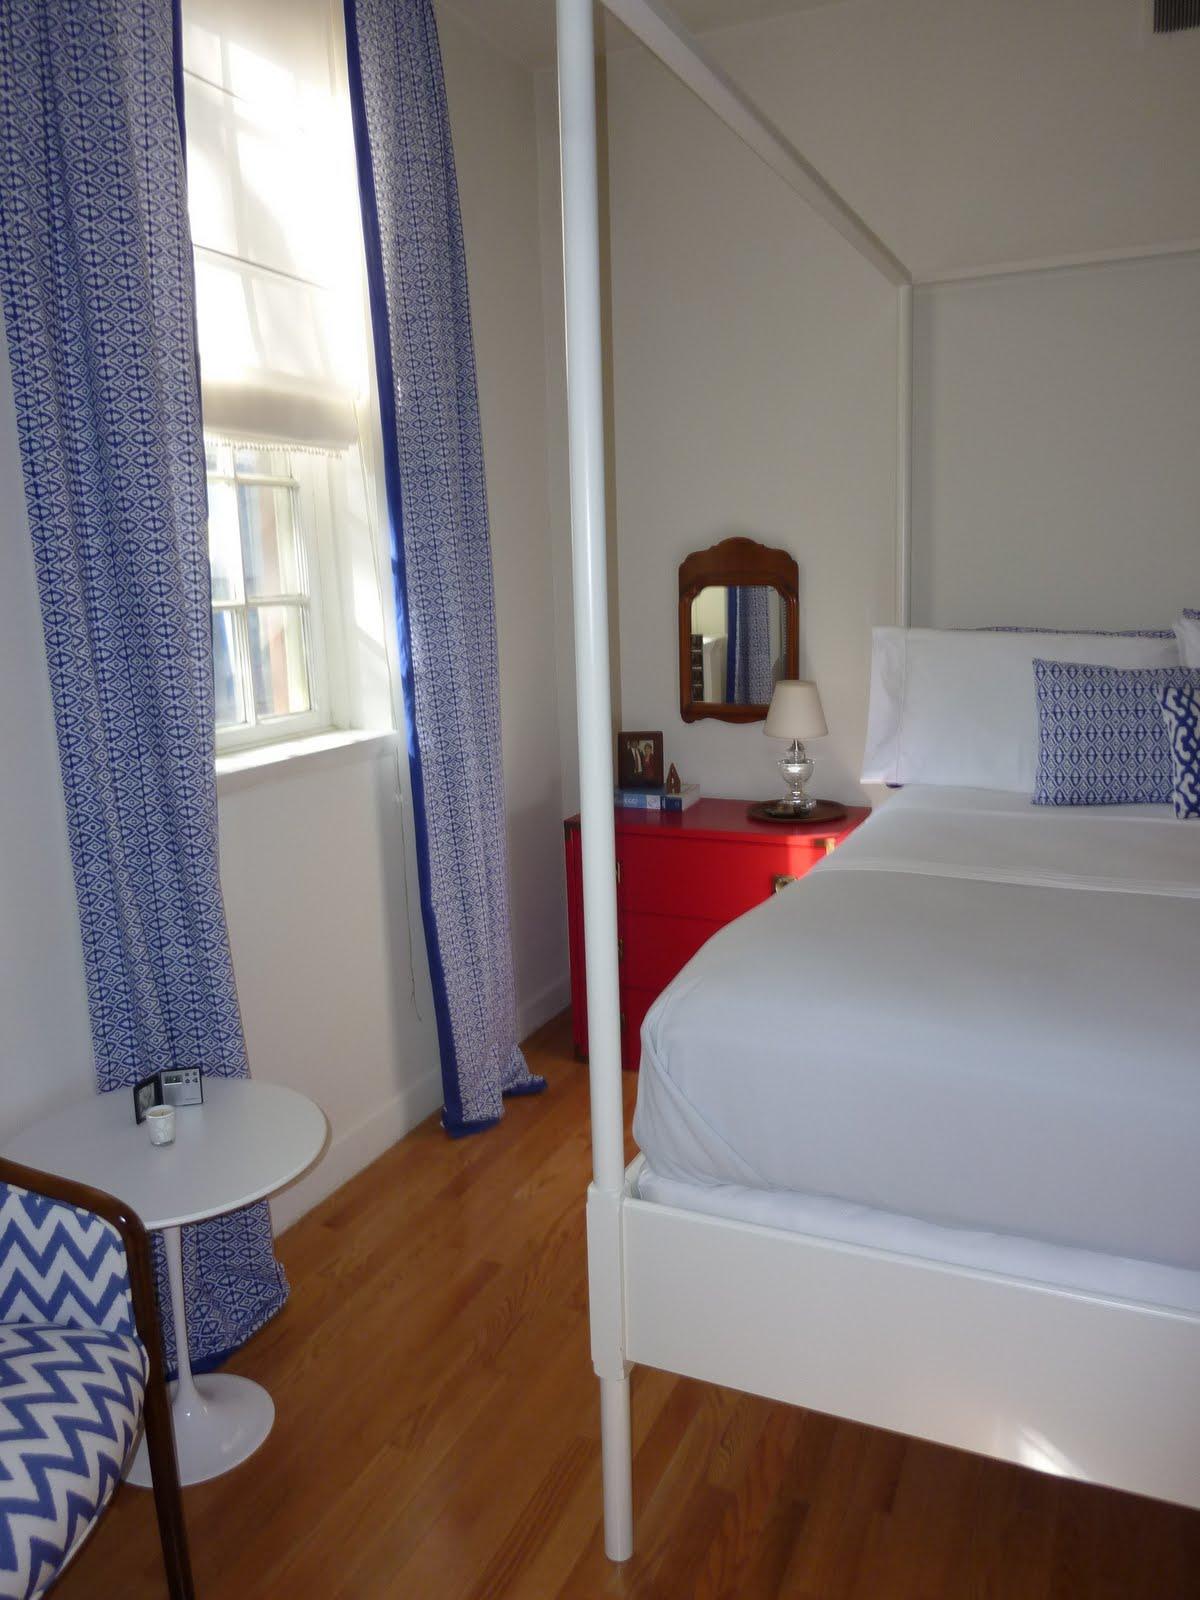 Meet me in philadelphia master bedroom tour for Craigslist 2 bedroom apartments philadelphia